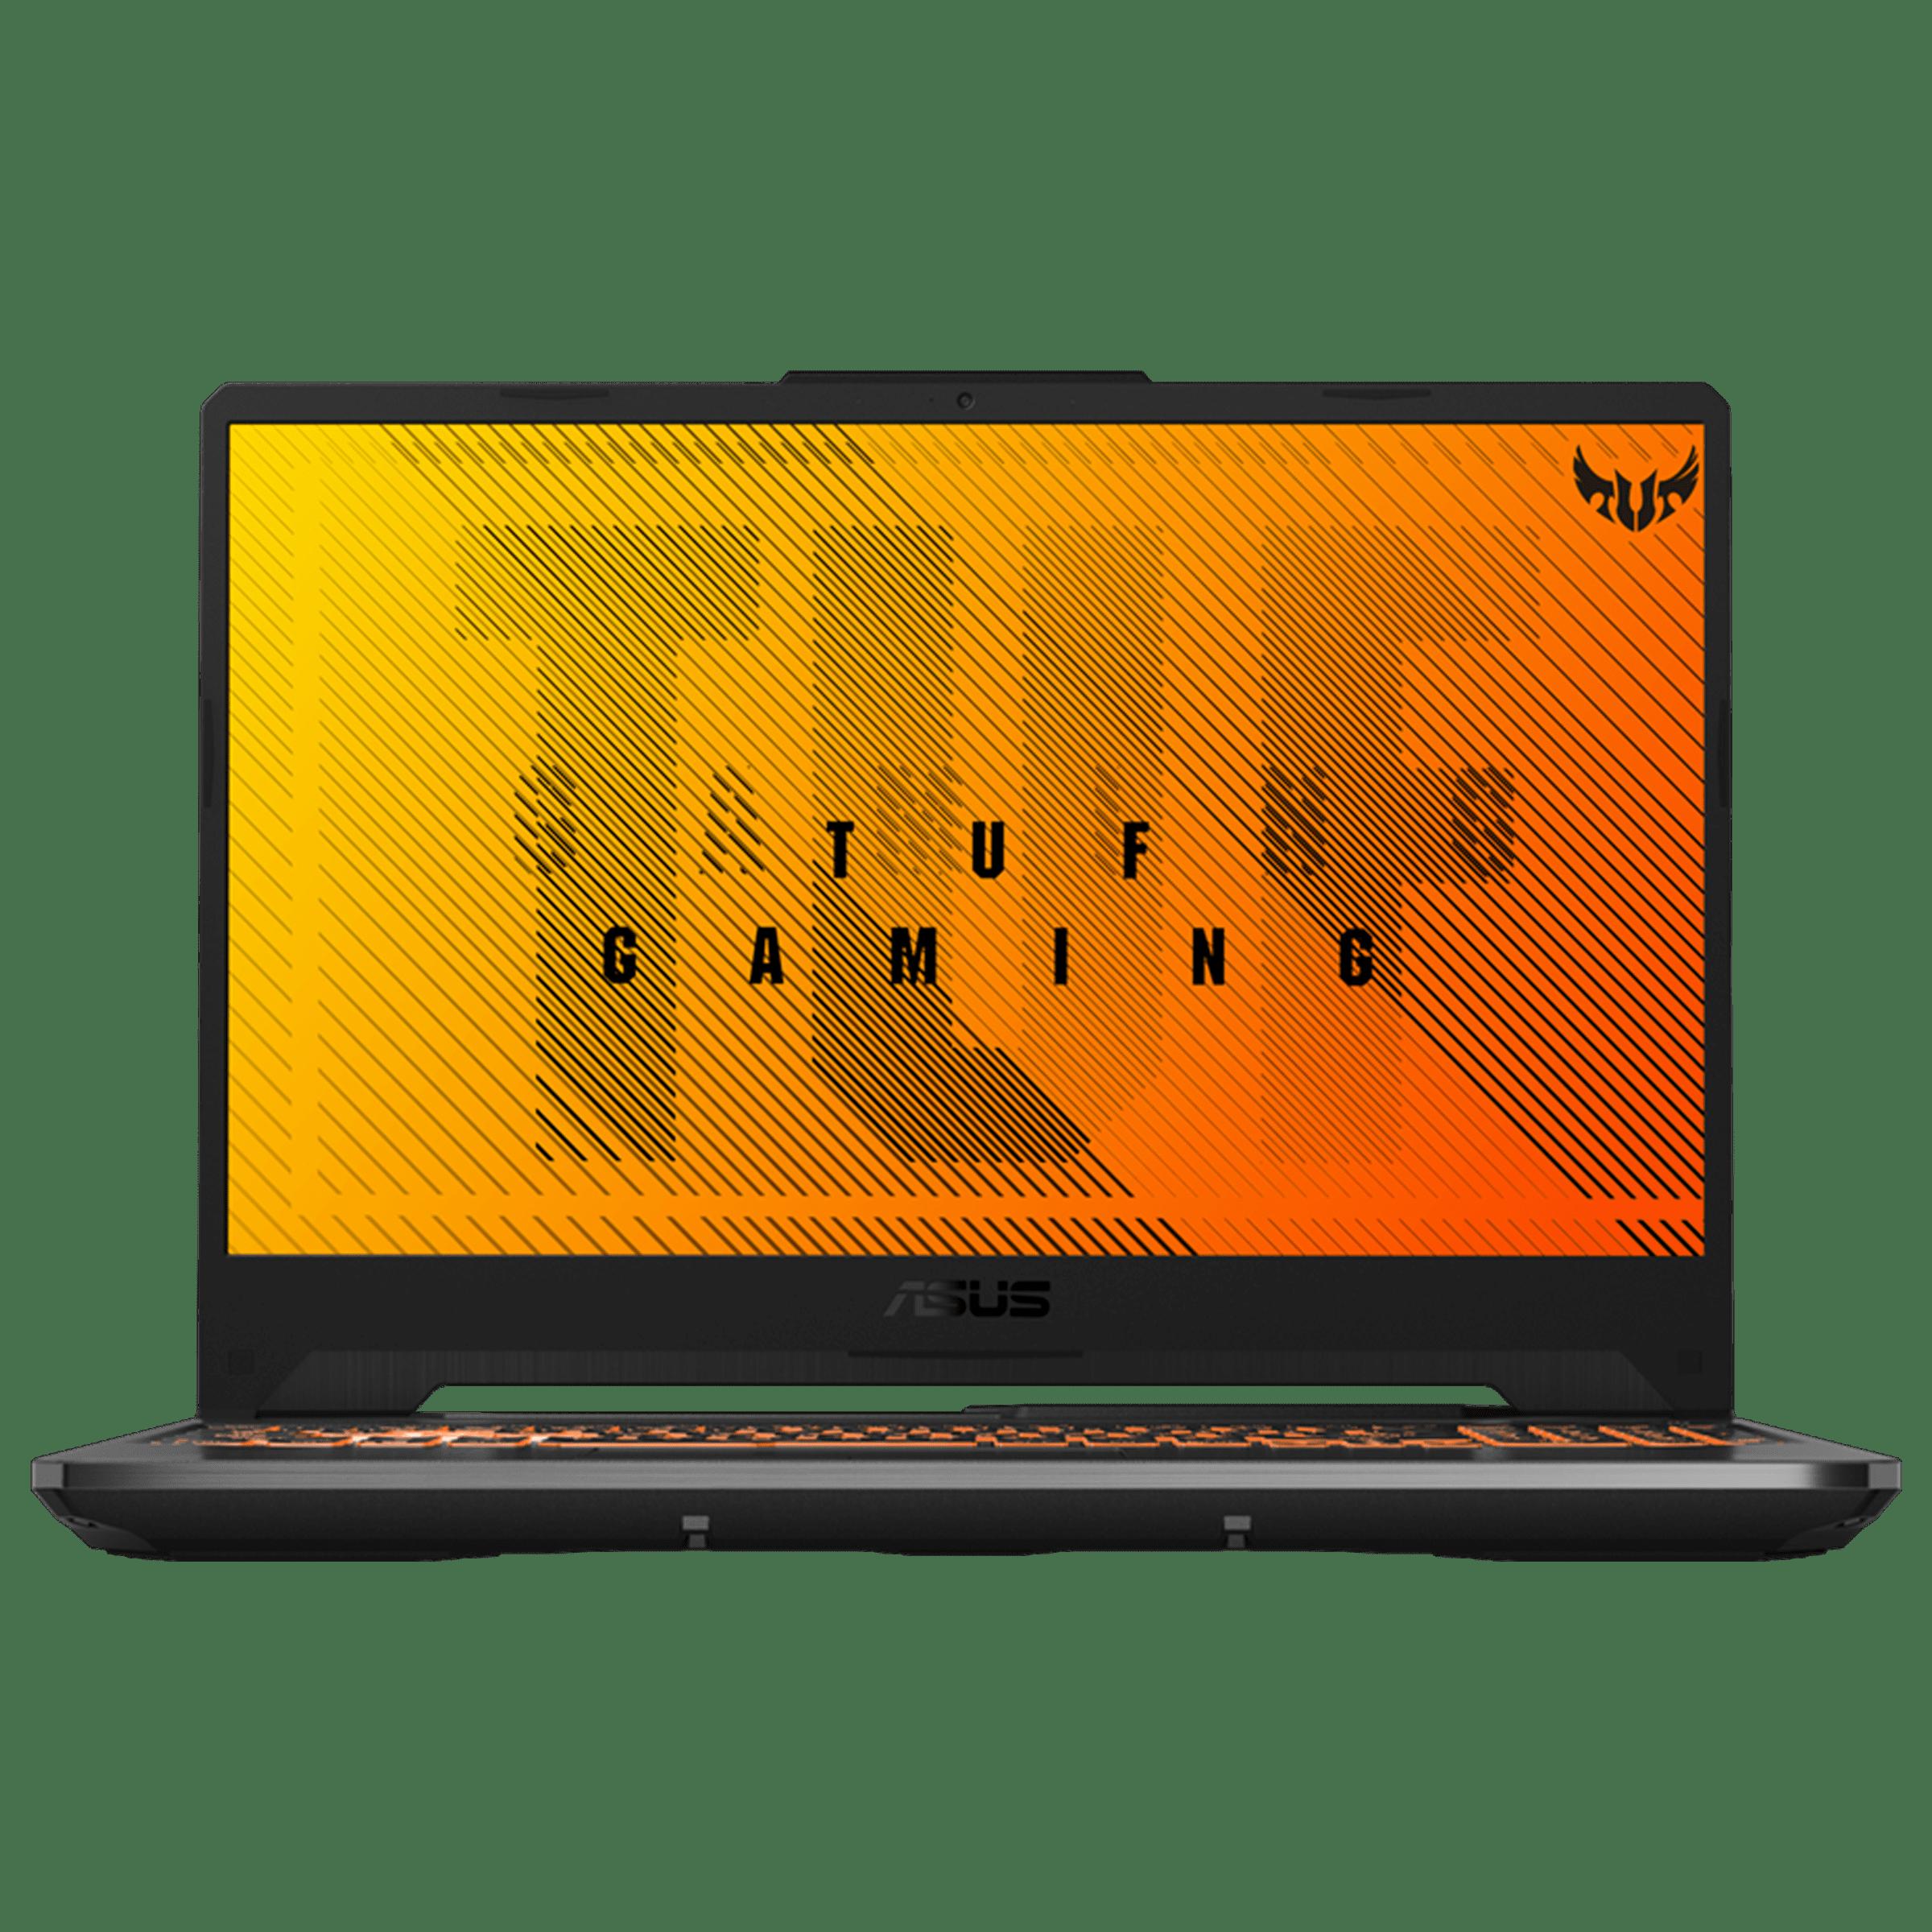 Asus TUF Gaming F15 (FX506LI-HN012TS) Core i5 10th Gen Windows 10 Home Gaming Laptop (8GB RAM, 512GB SSD, NVIDIA GeForce GTX 1650 Ti + 4GB Graphics, MS Office, 39.62cm, Bonfire Black)